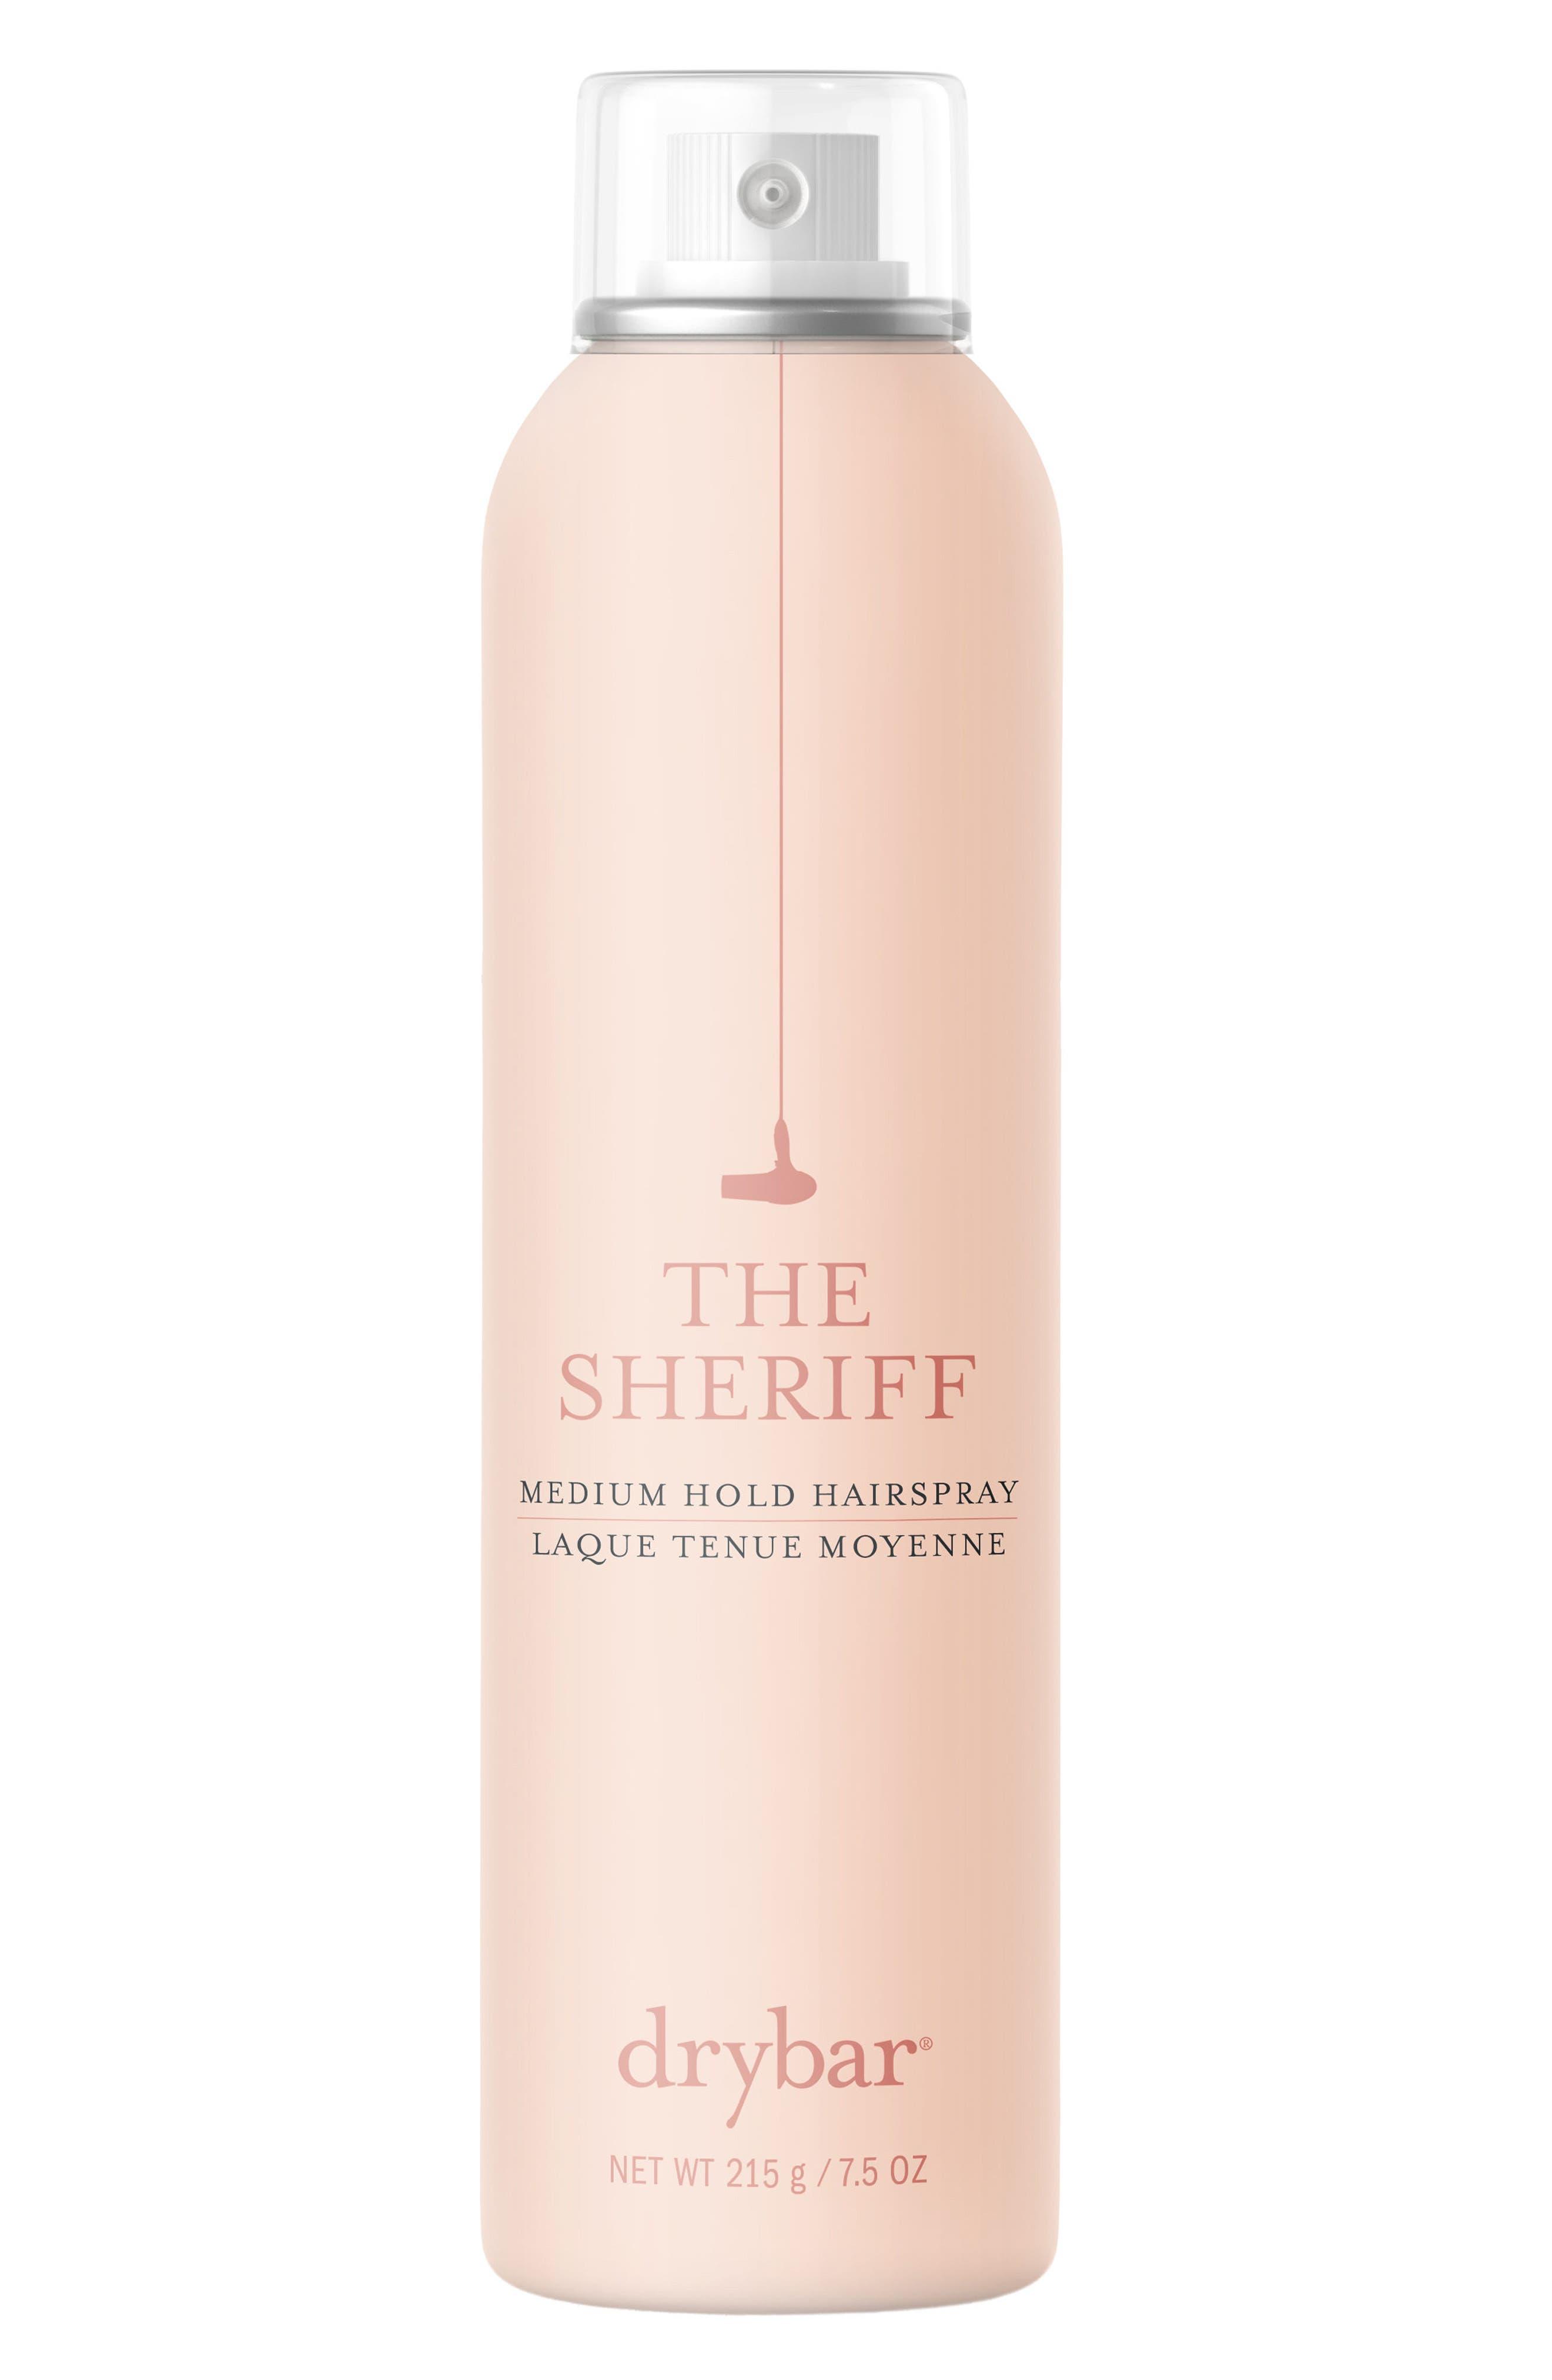 The Sheriff Medium Hold Hairspray